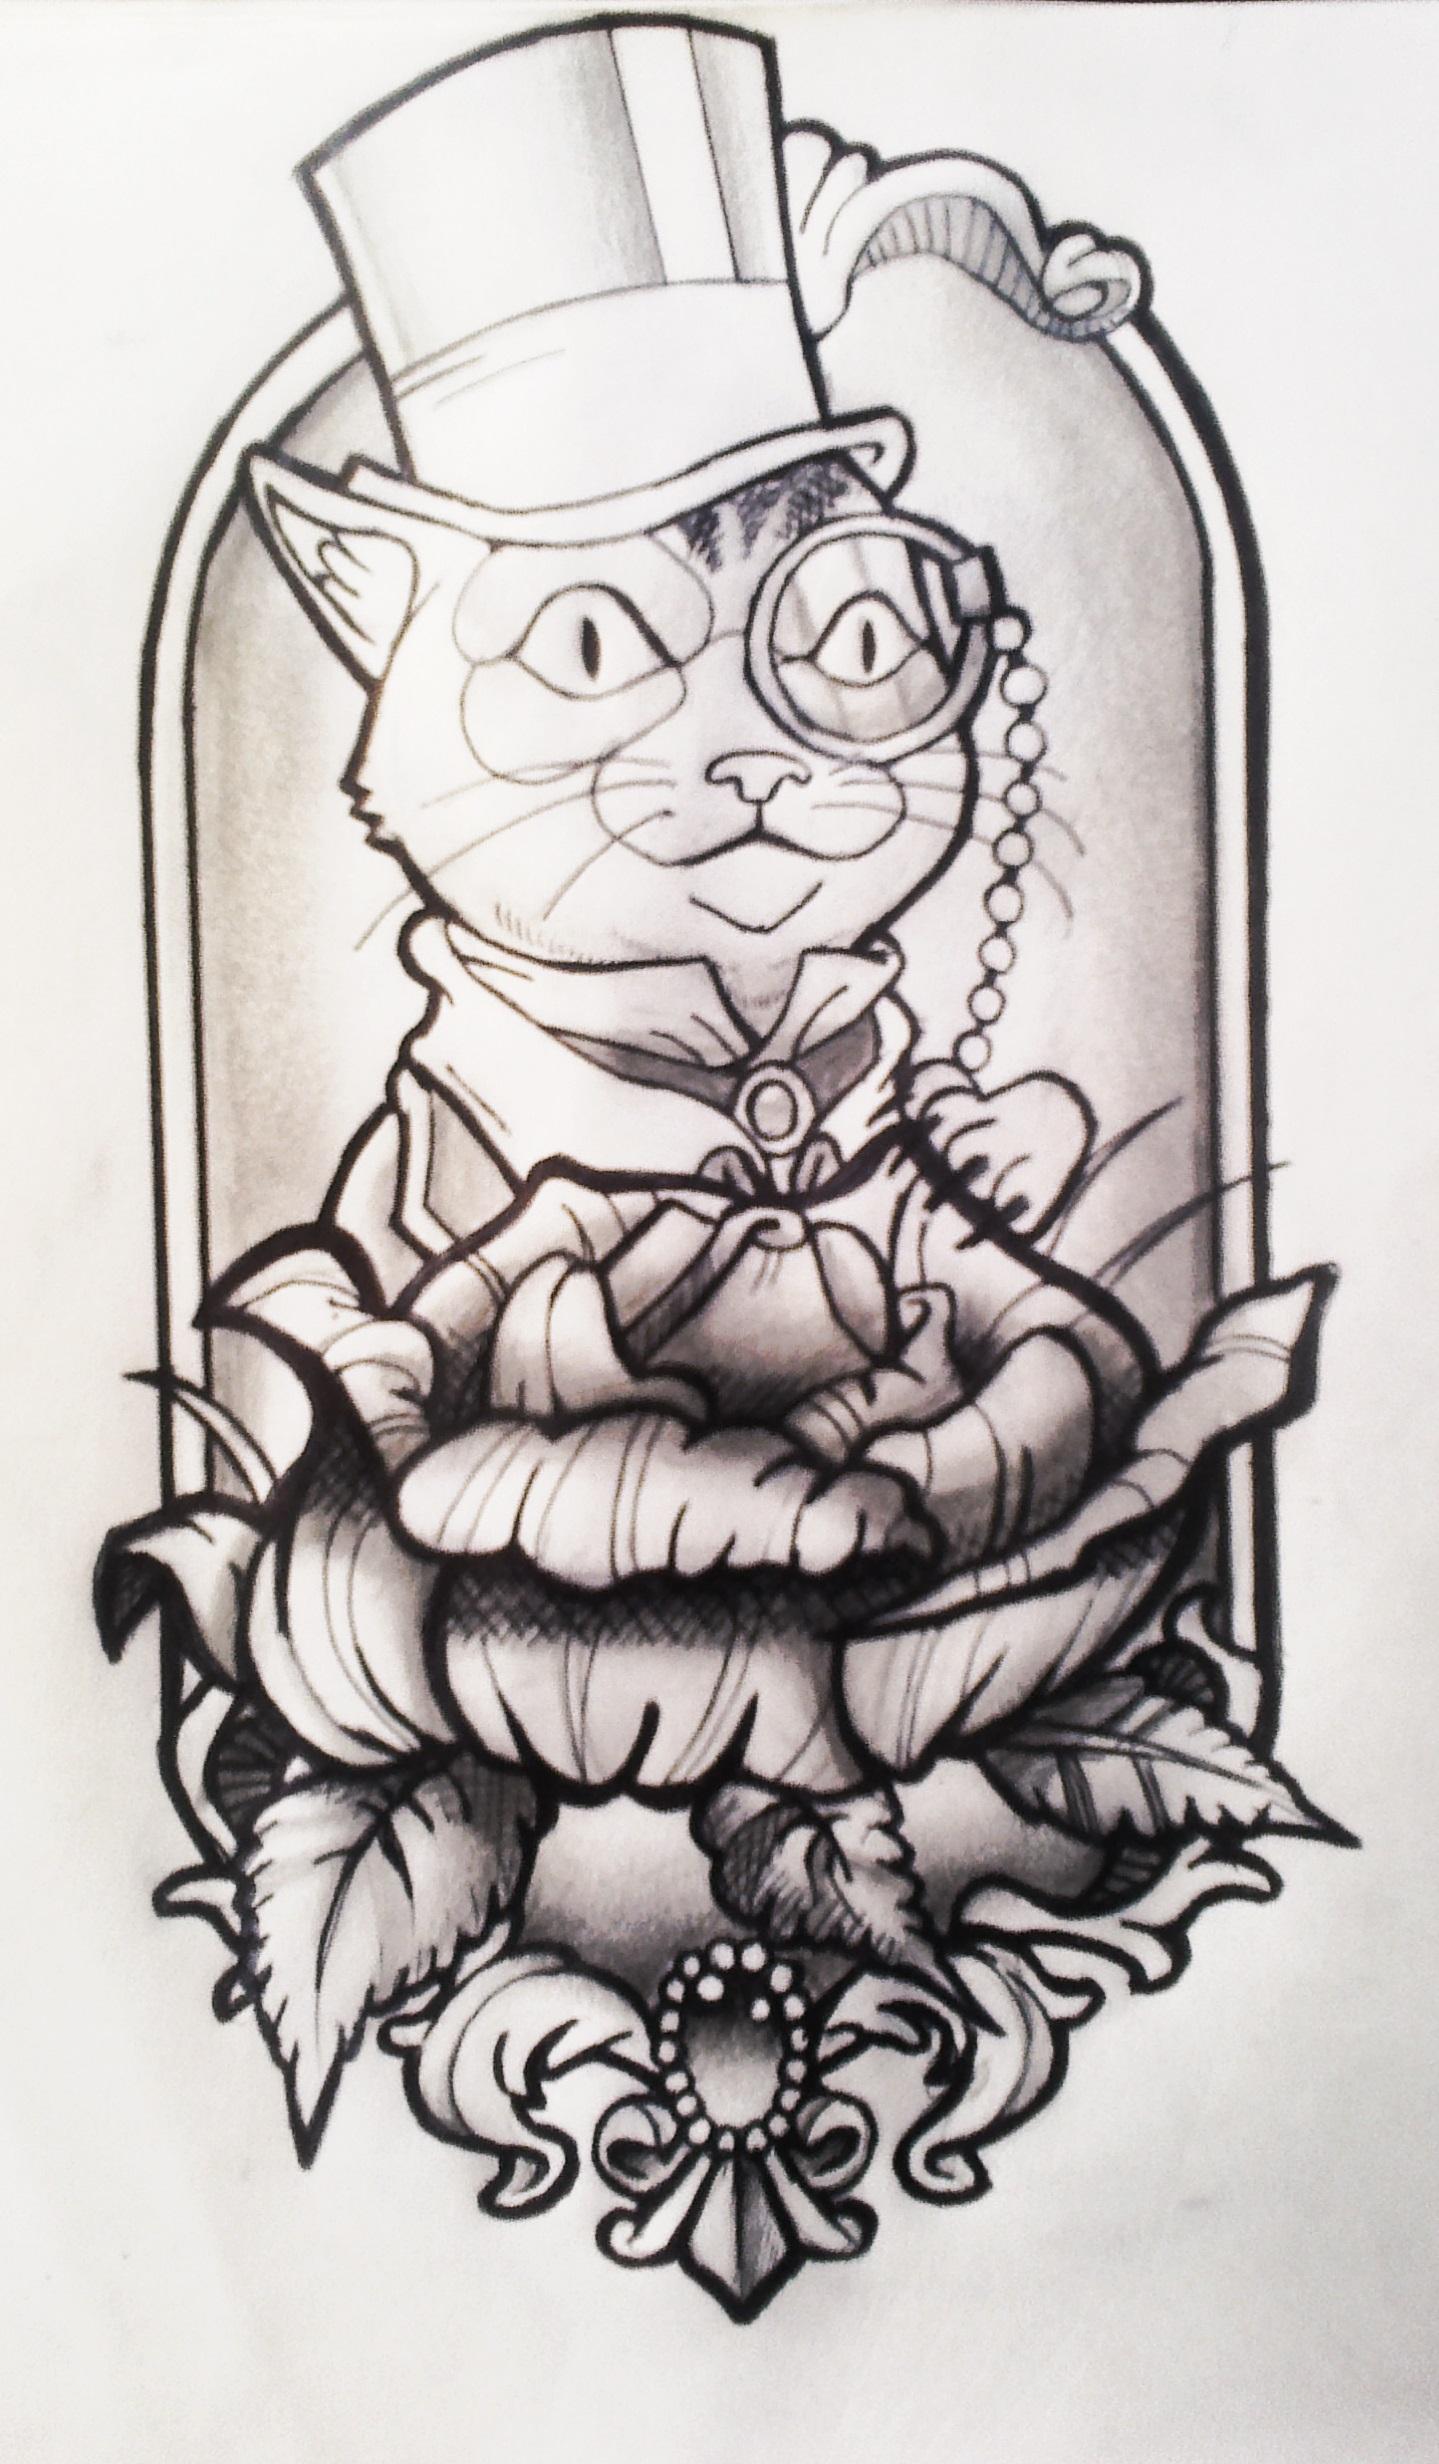 dressed cat neotraditional tattoo design by fabian alvarez sosa on deviantart. Black Bedroom Furniture Sets. Home Design Ideas